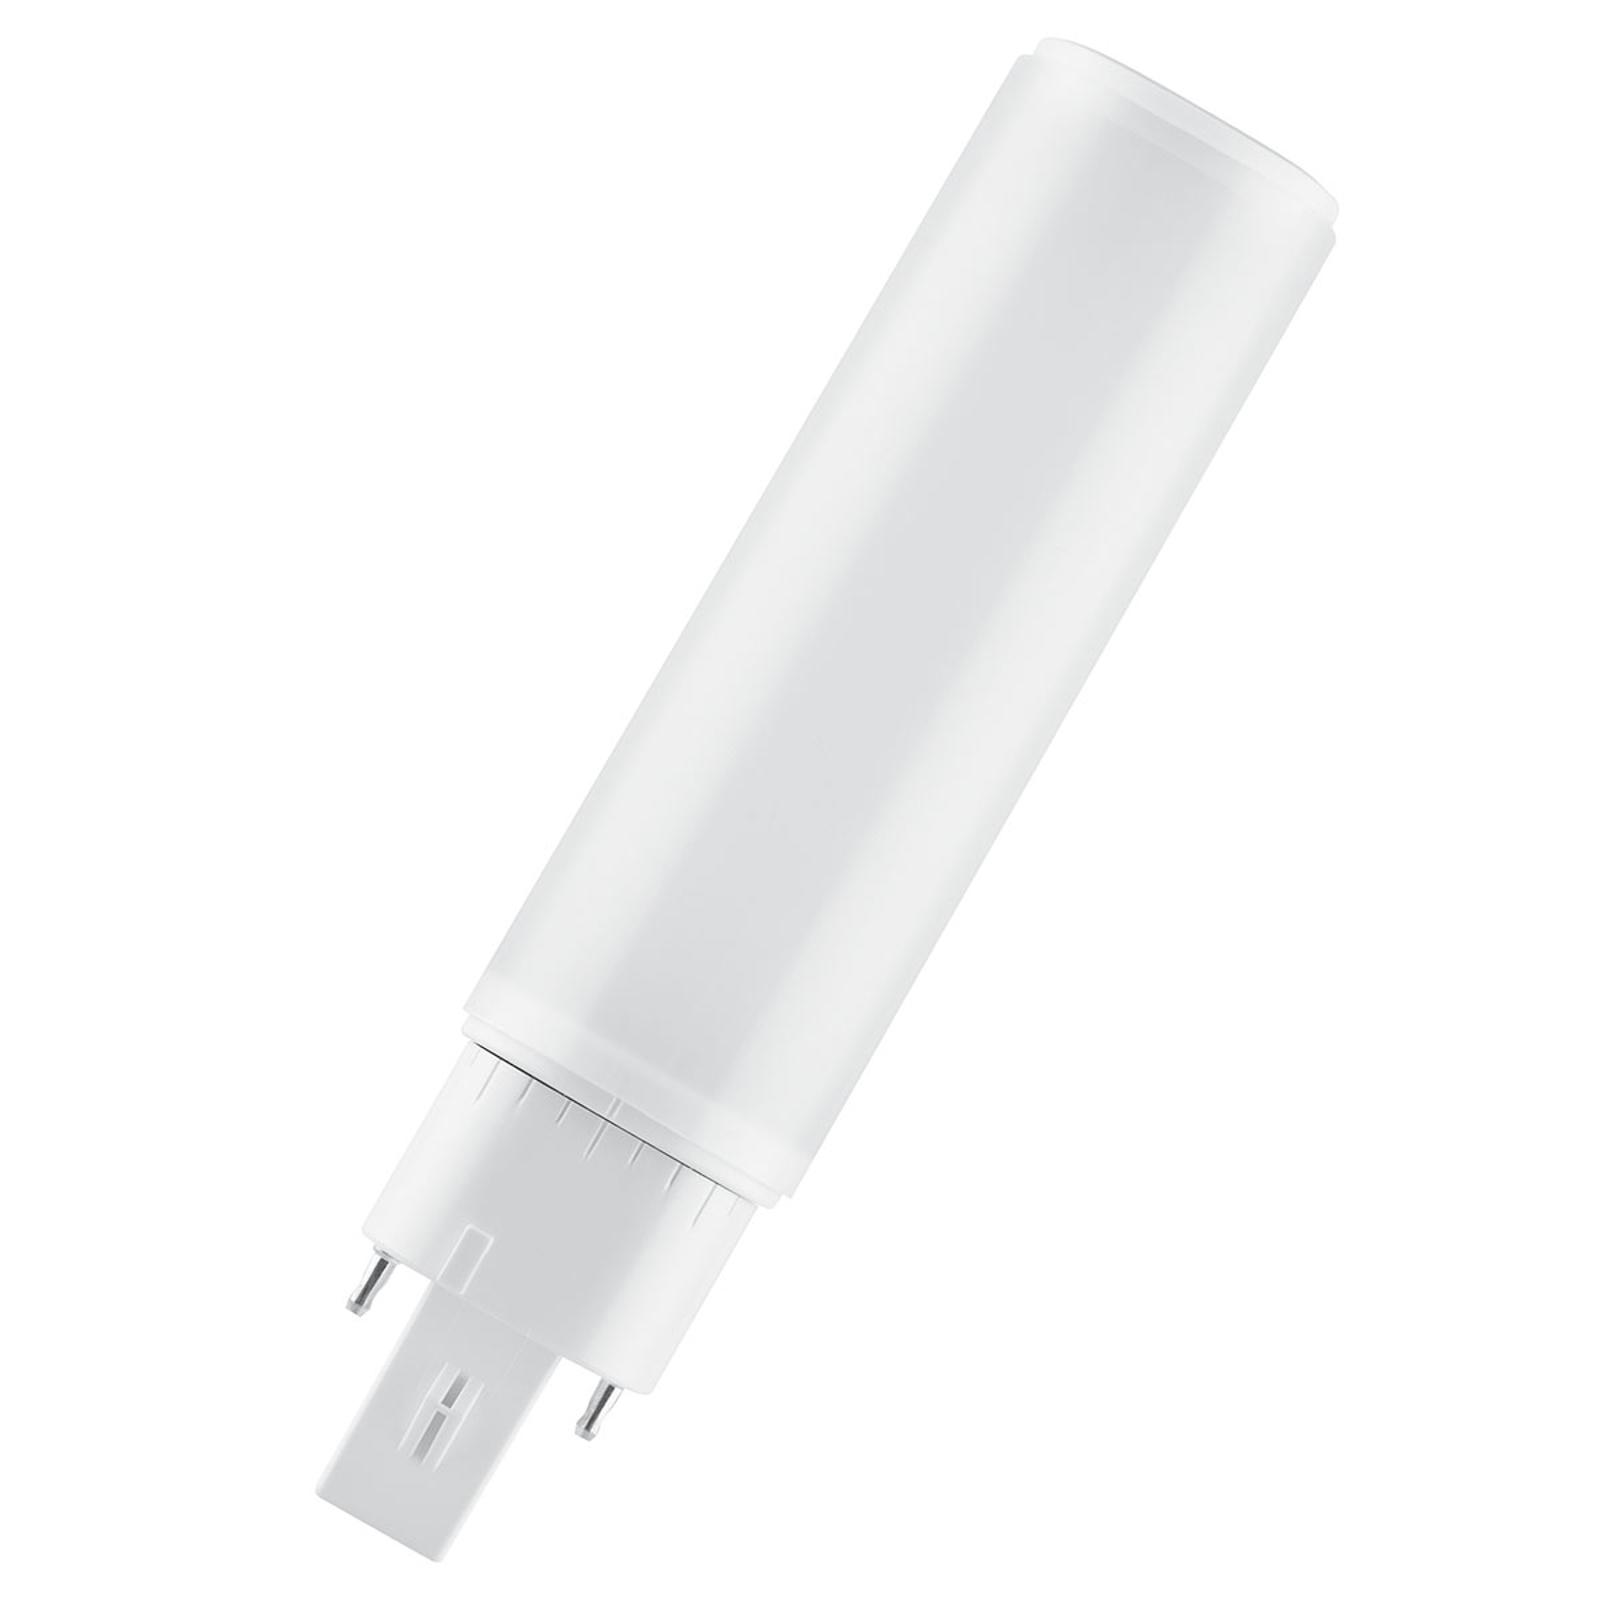 OSRAM LED-Lampe G24q-2 7W 3.000K